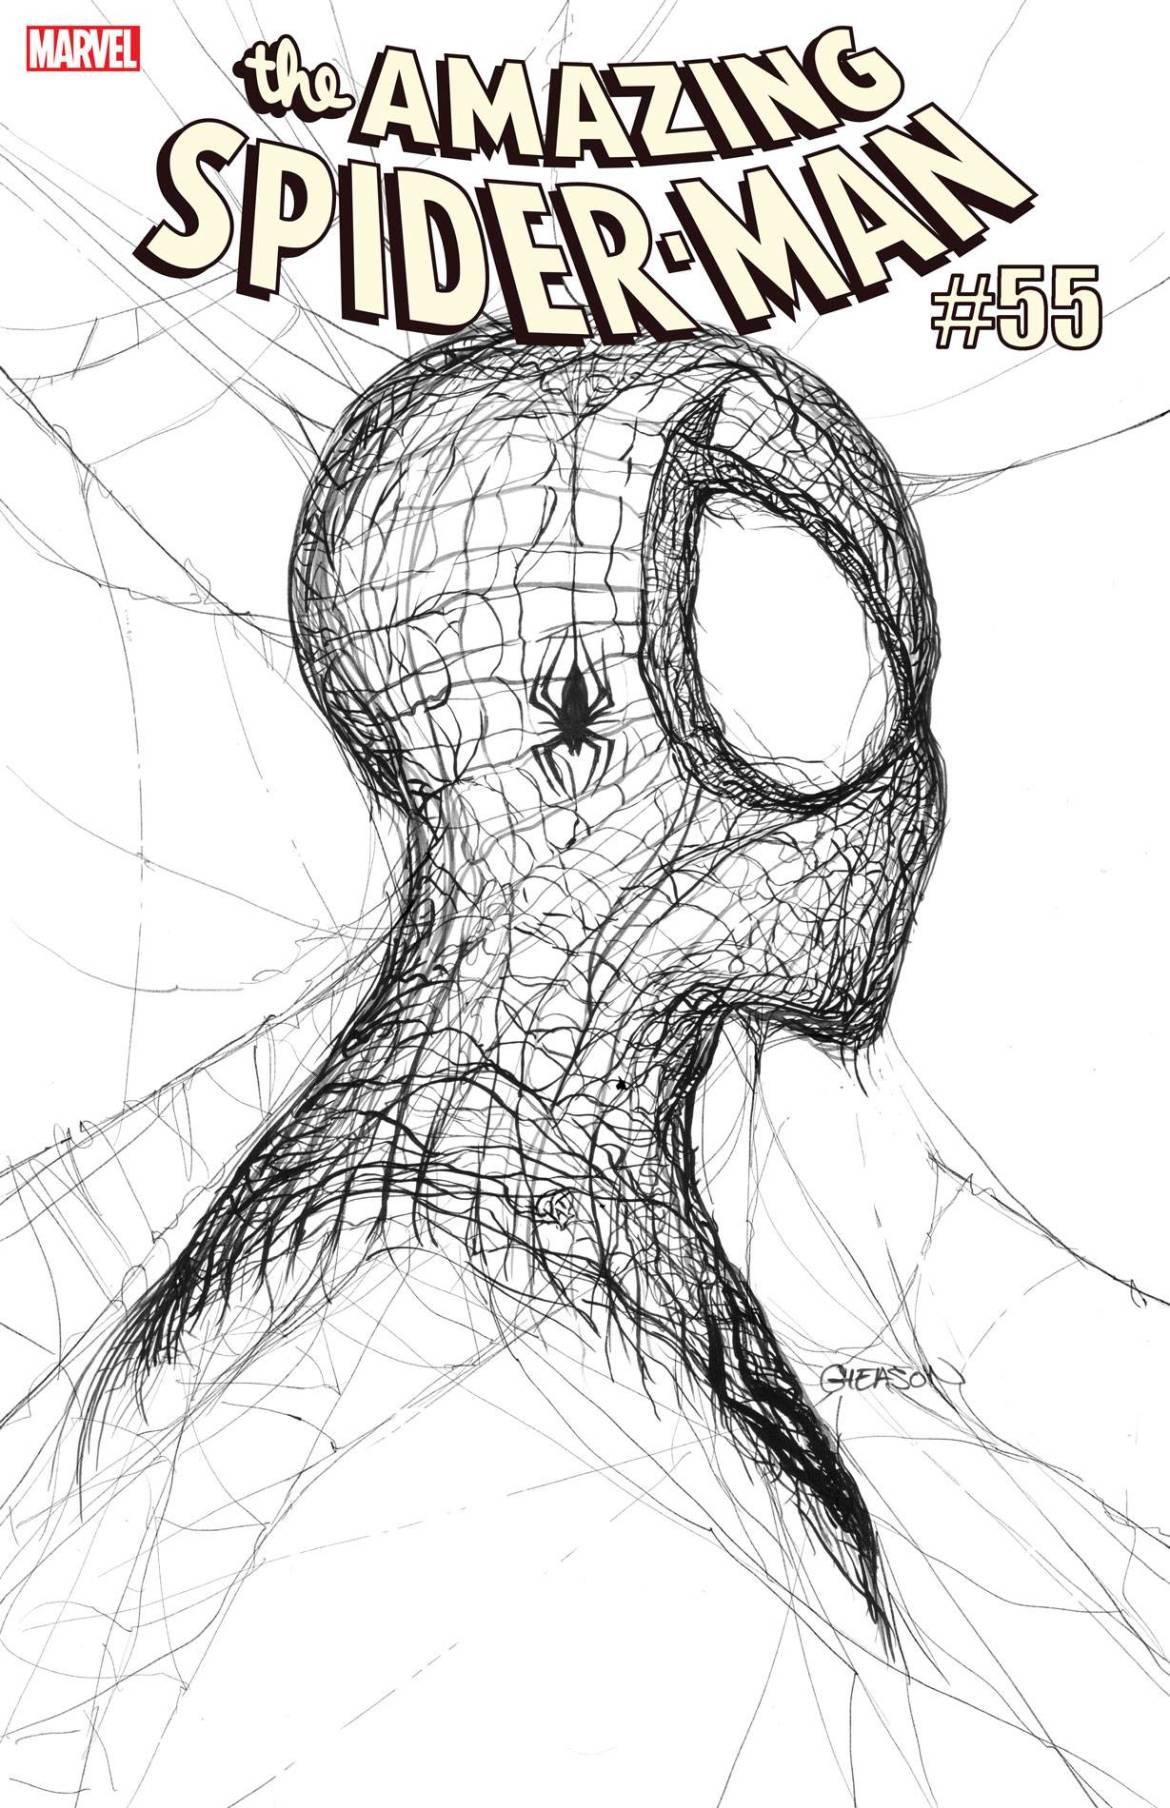 STL183623 ComicList: Marvel Comics New Releases for 02/03/2021